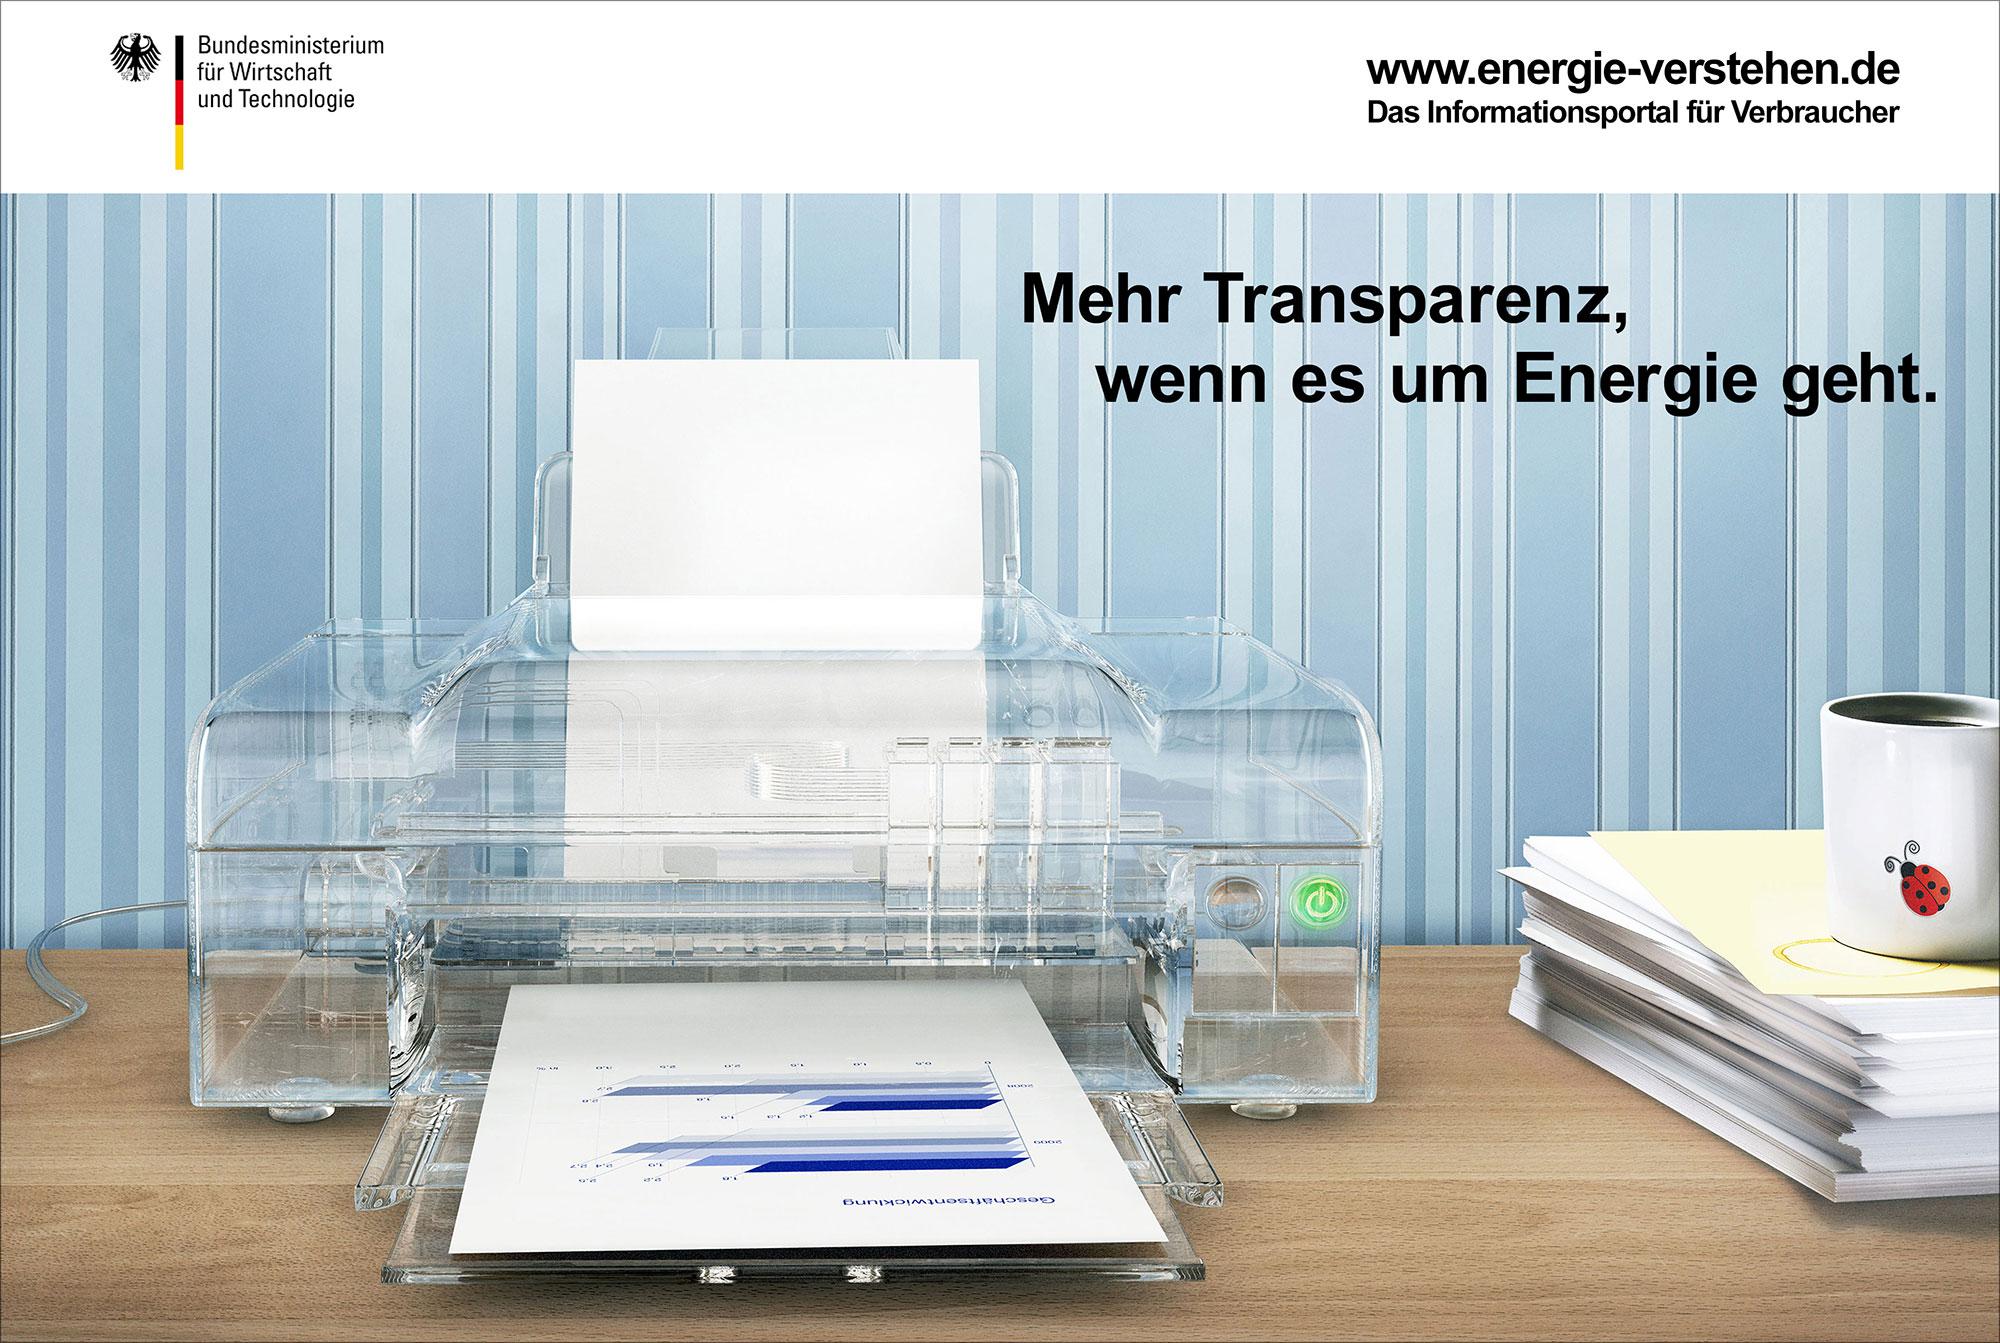 Advertising CGI Rendering 3d BMWI Energie transparent Transparenz Energie Drucker Kaffeetasse Retro Tapete Idris Kolodziej